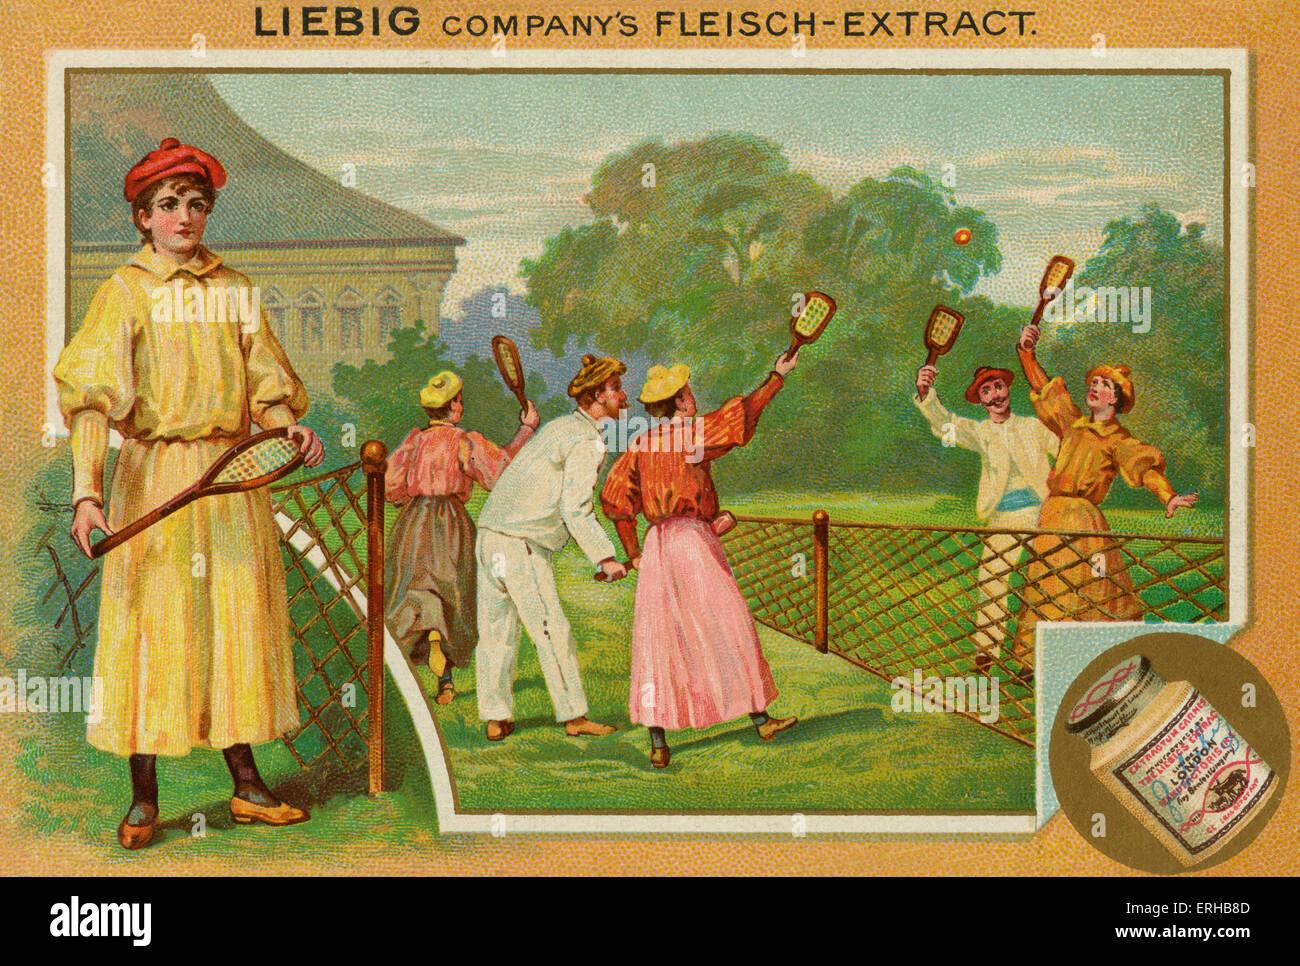 Un match de tennis sur gazon. Carte Liebig, Sports, 1896. Photo Stock